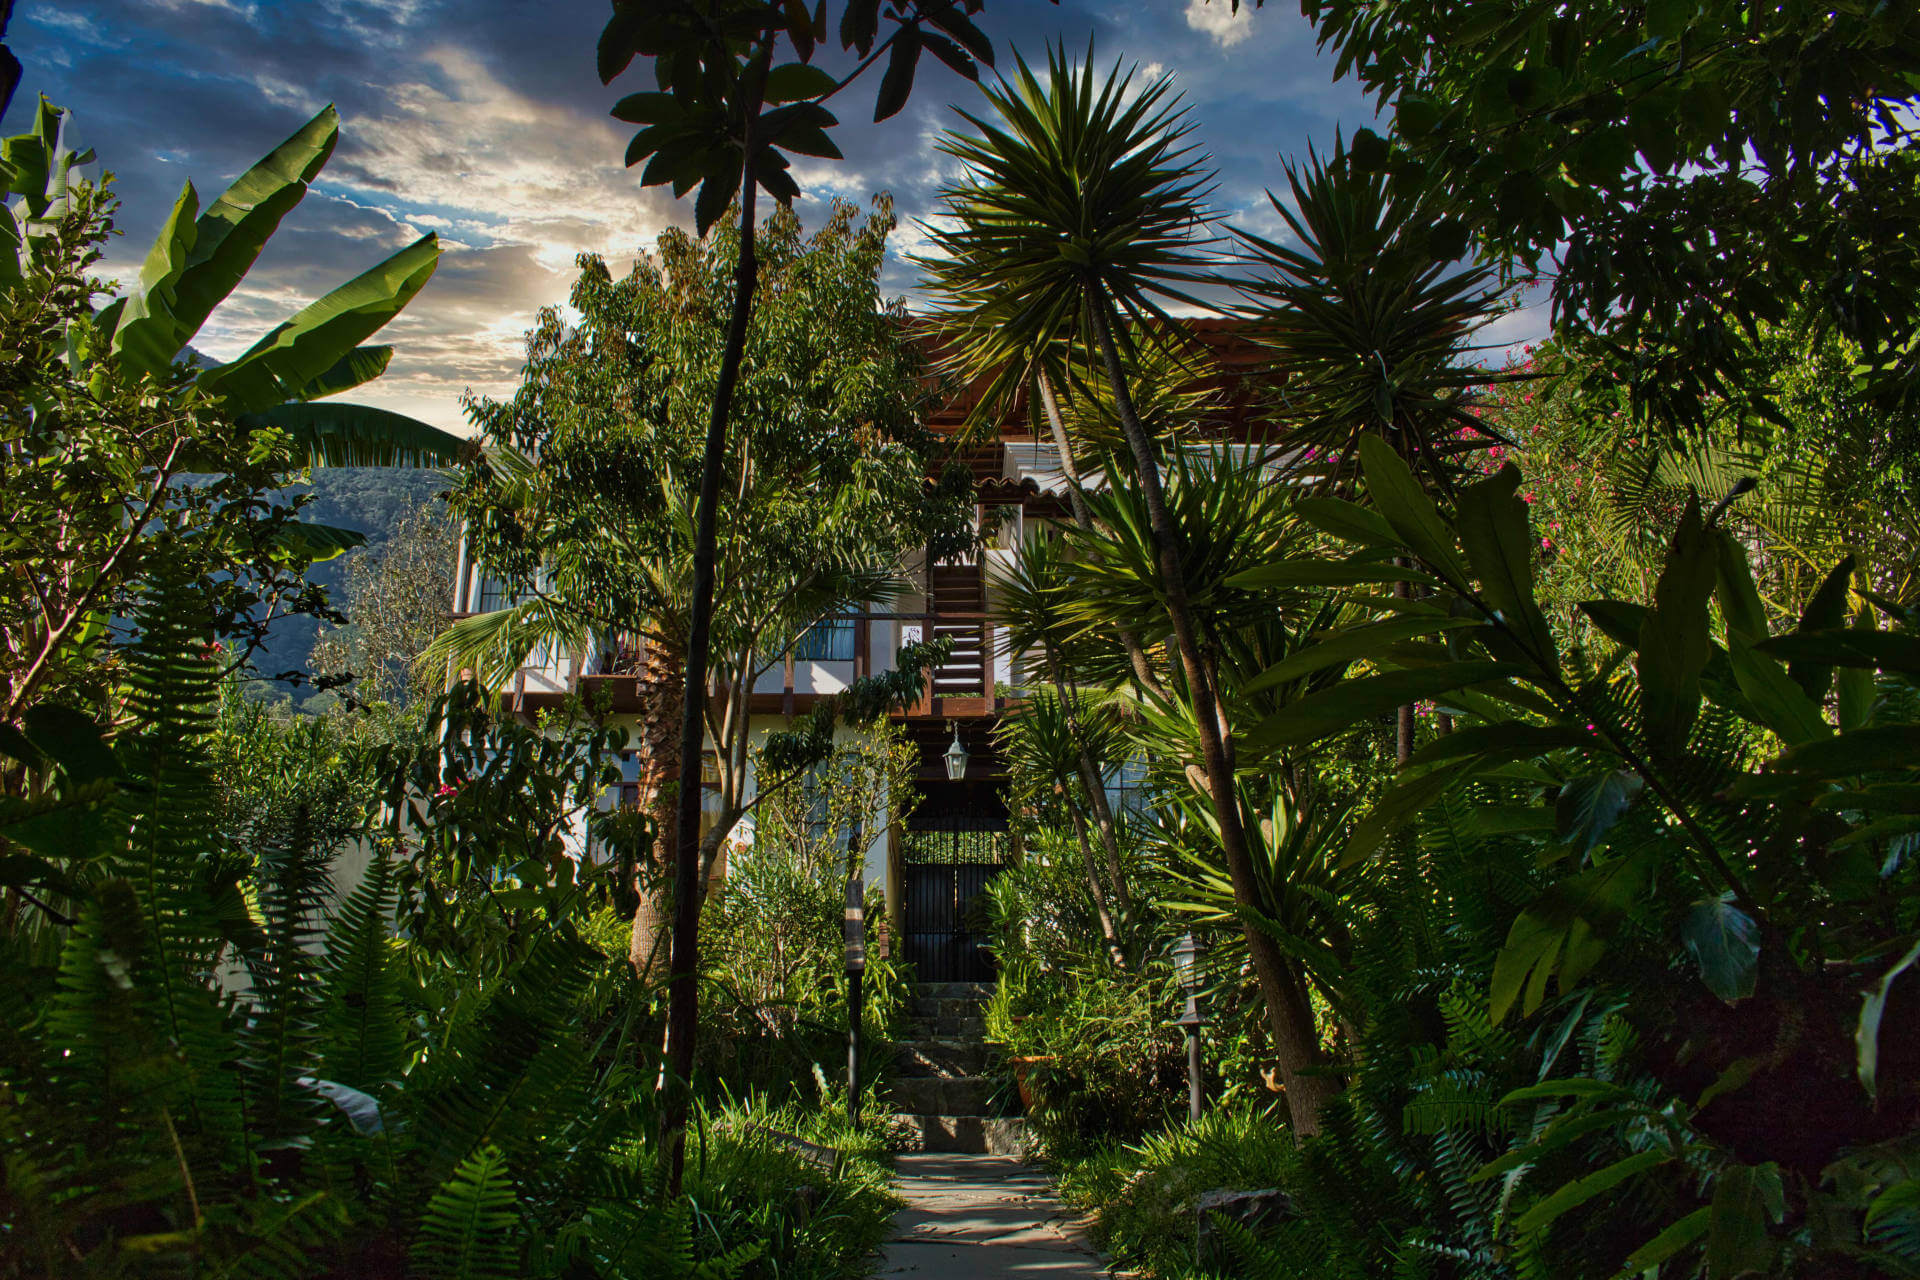 The Casa Lobo Bungalows garden is located in San Pedro la Laguna at the Lake Atitlán in Guatemala.